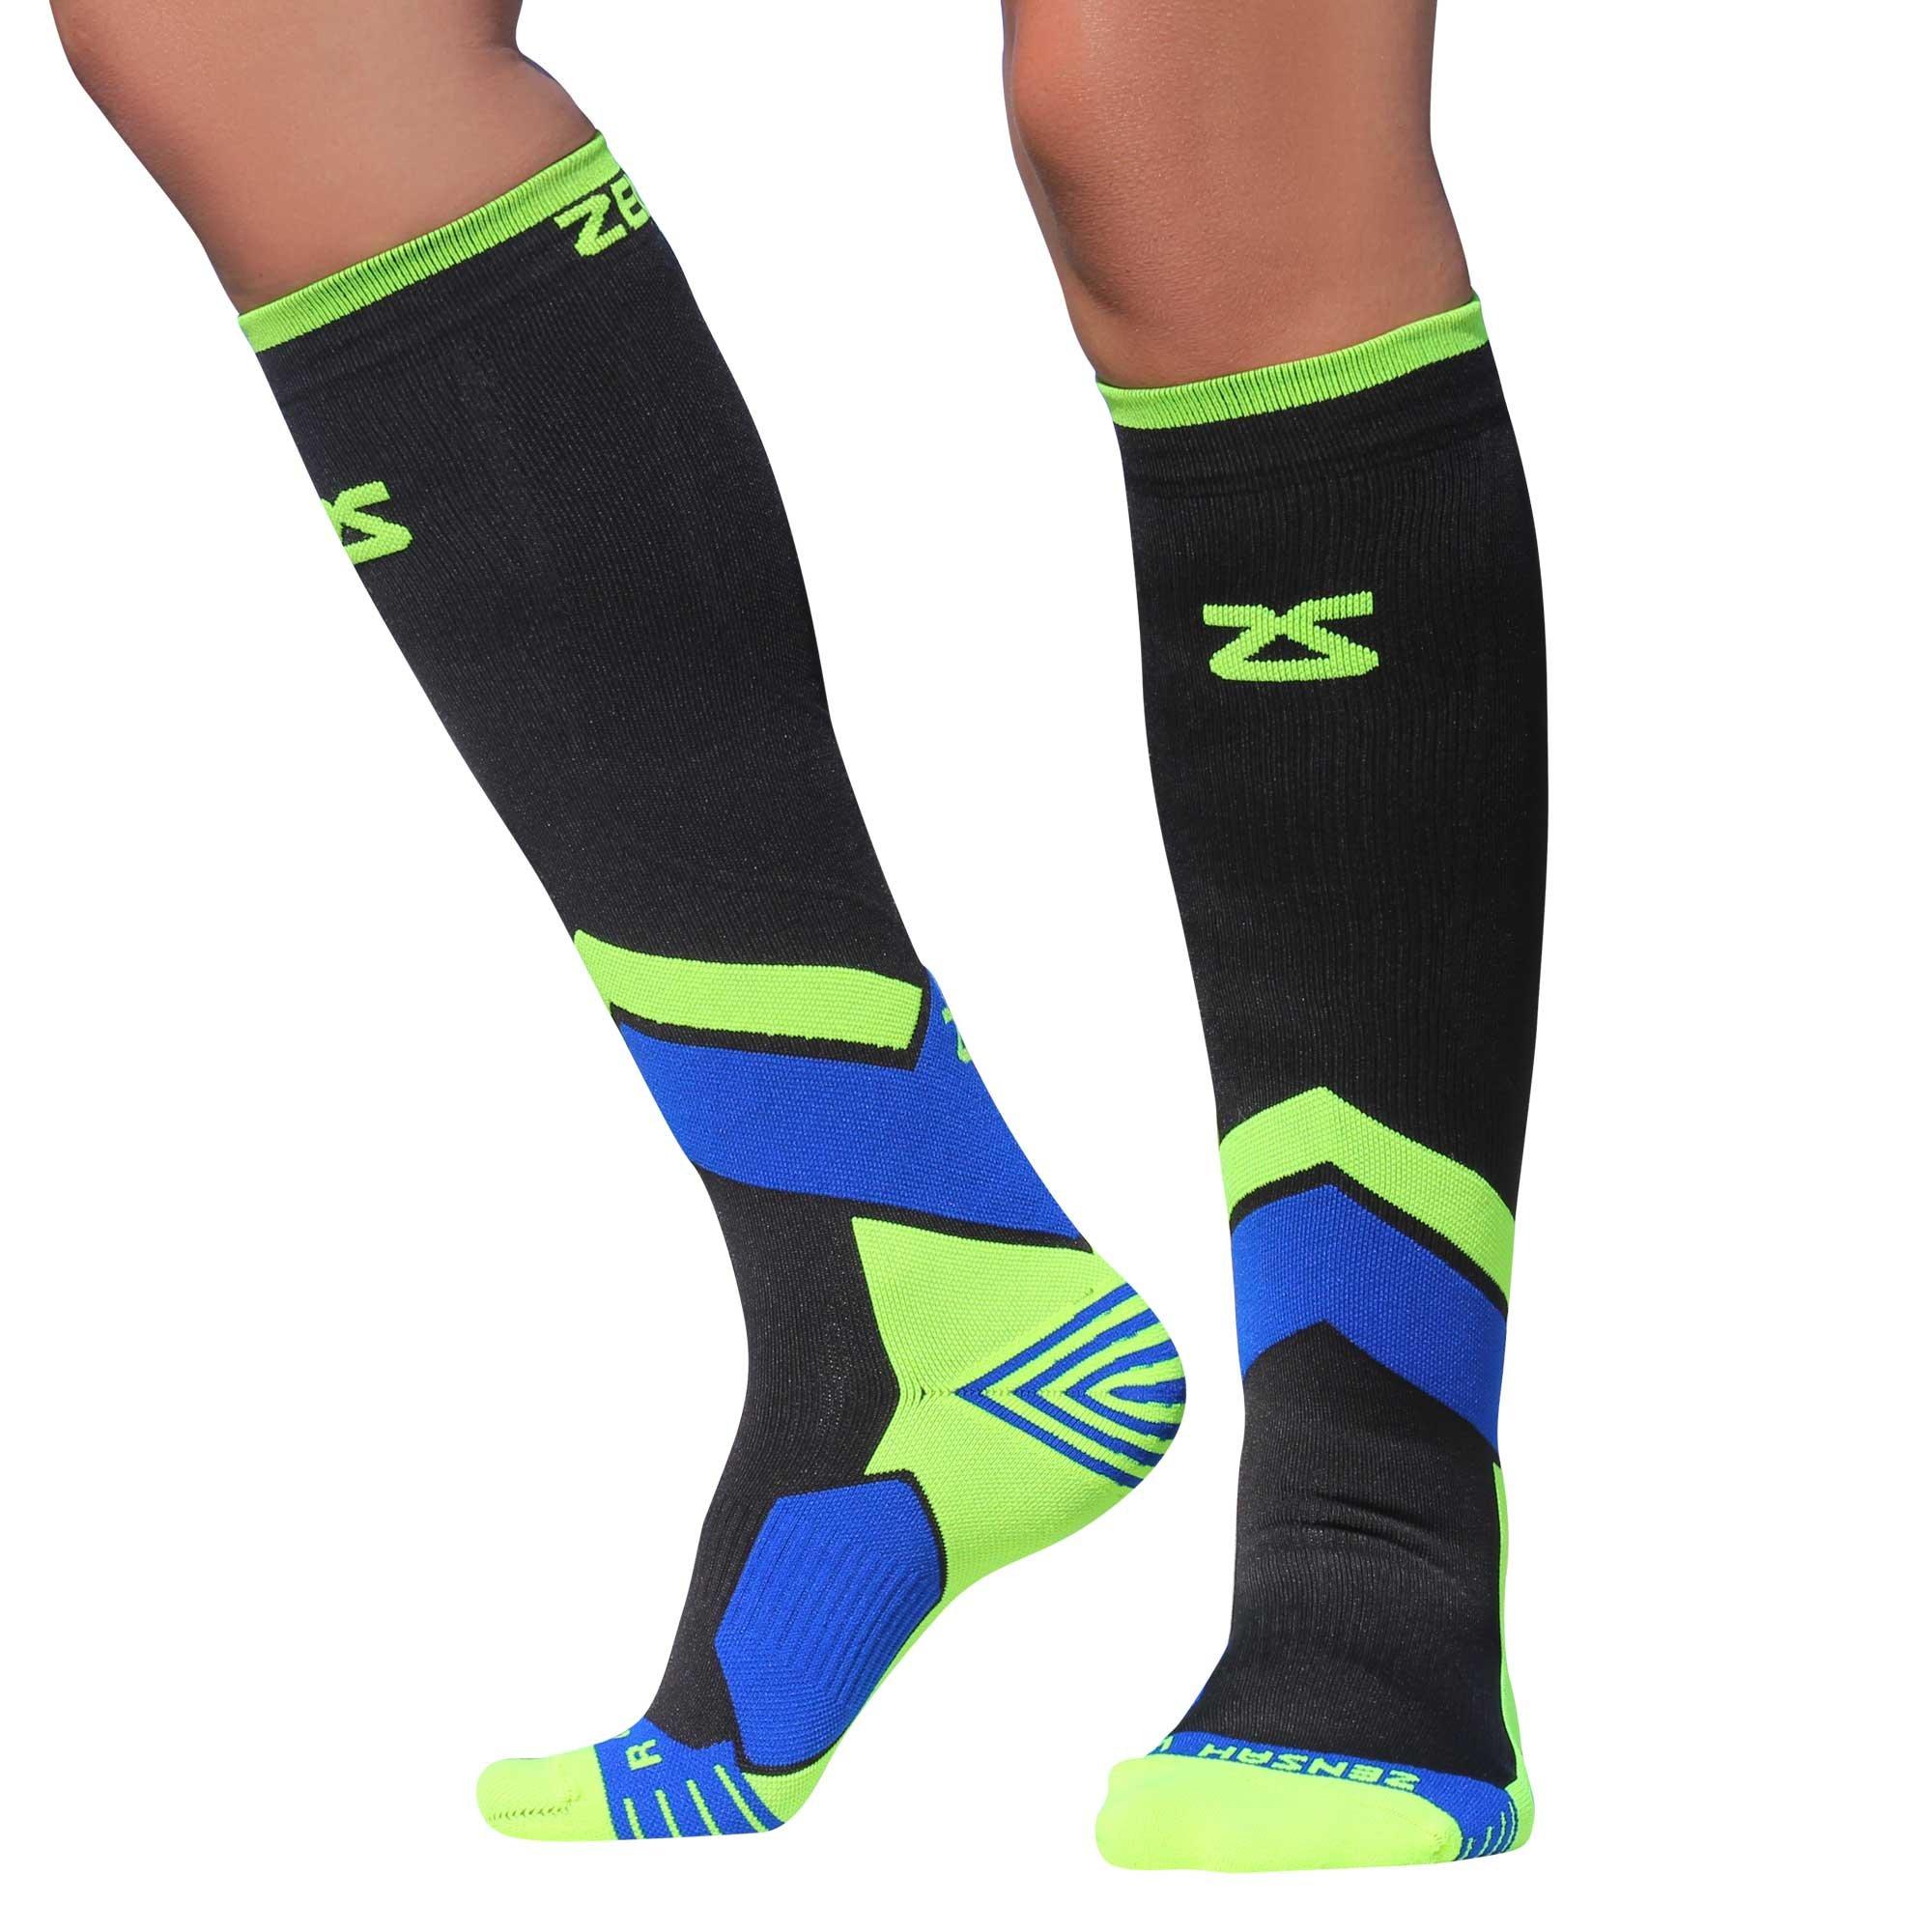 Zensah Pop Tech+ Compression Graduated Compression Socks, Black/Yellow/Blue, Small